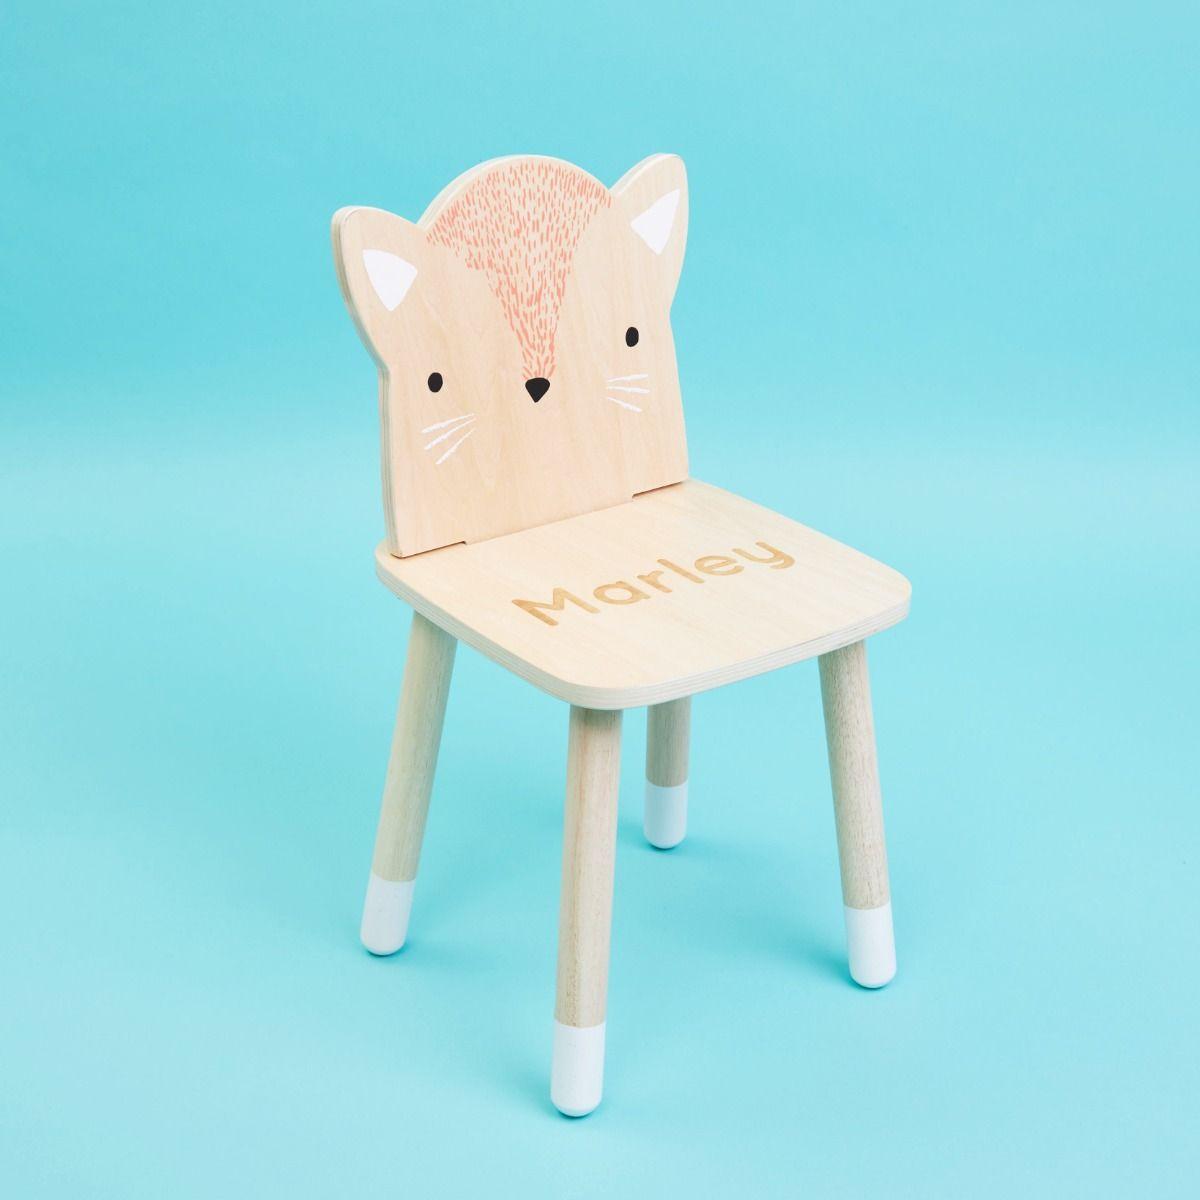 Personalised Wooden Fox Design Children's Chair